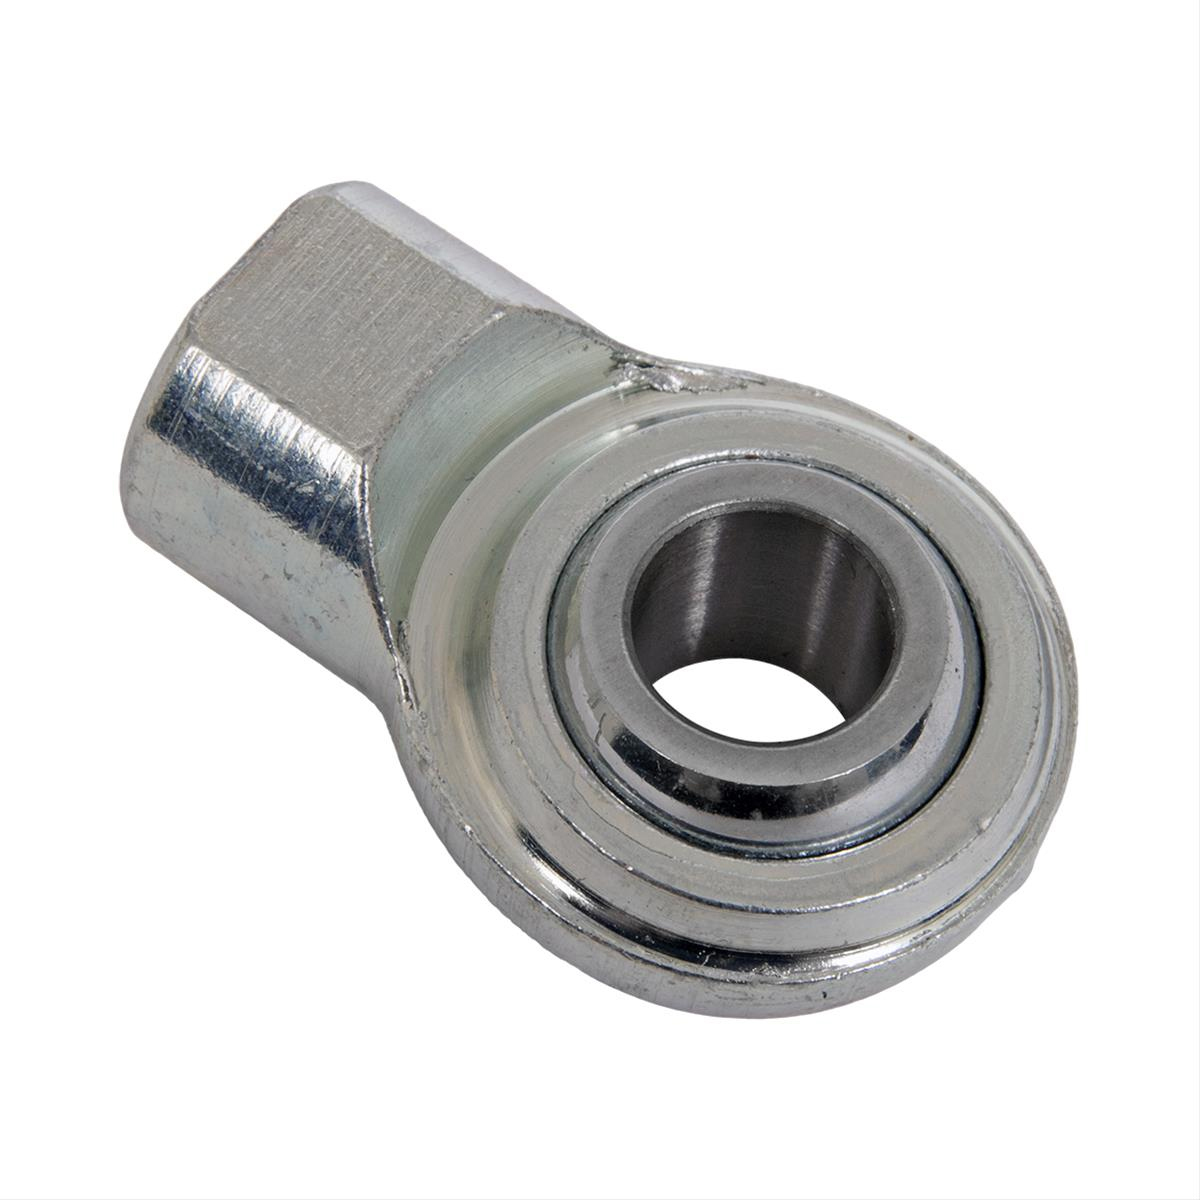 Bilstein E4-LG0-Z010A00 Shock End, Spherical, 3/8-24 in Thread, Bearing Included, Steel, Each